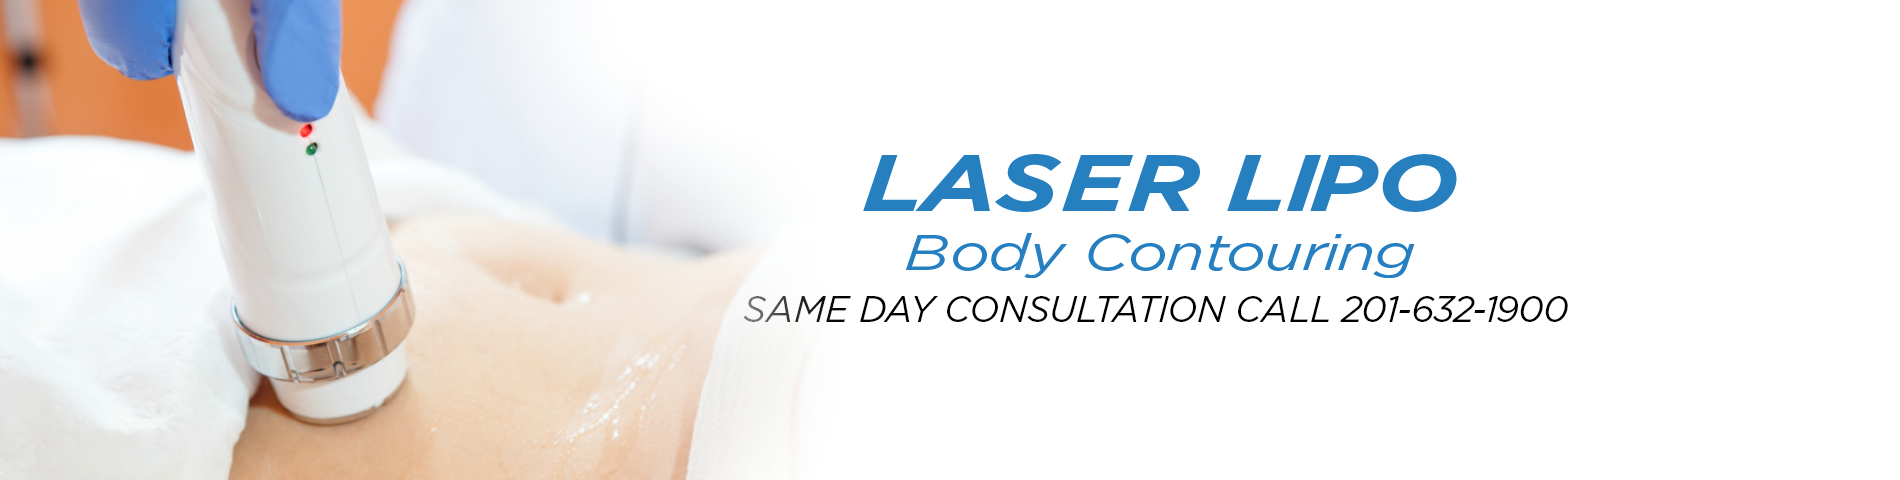 Laser LIPO Body Contouring